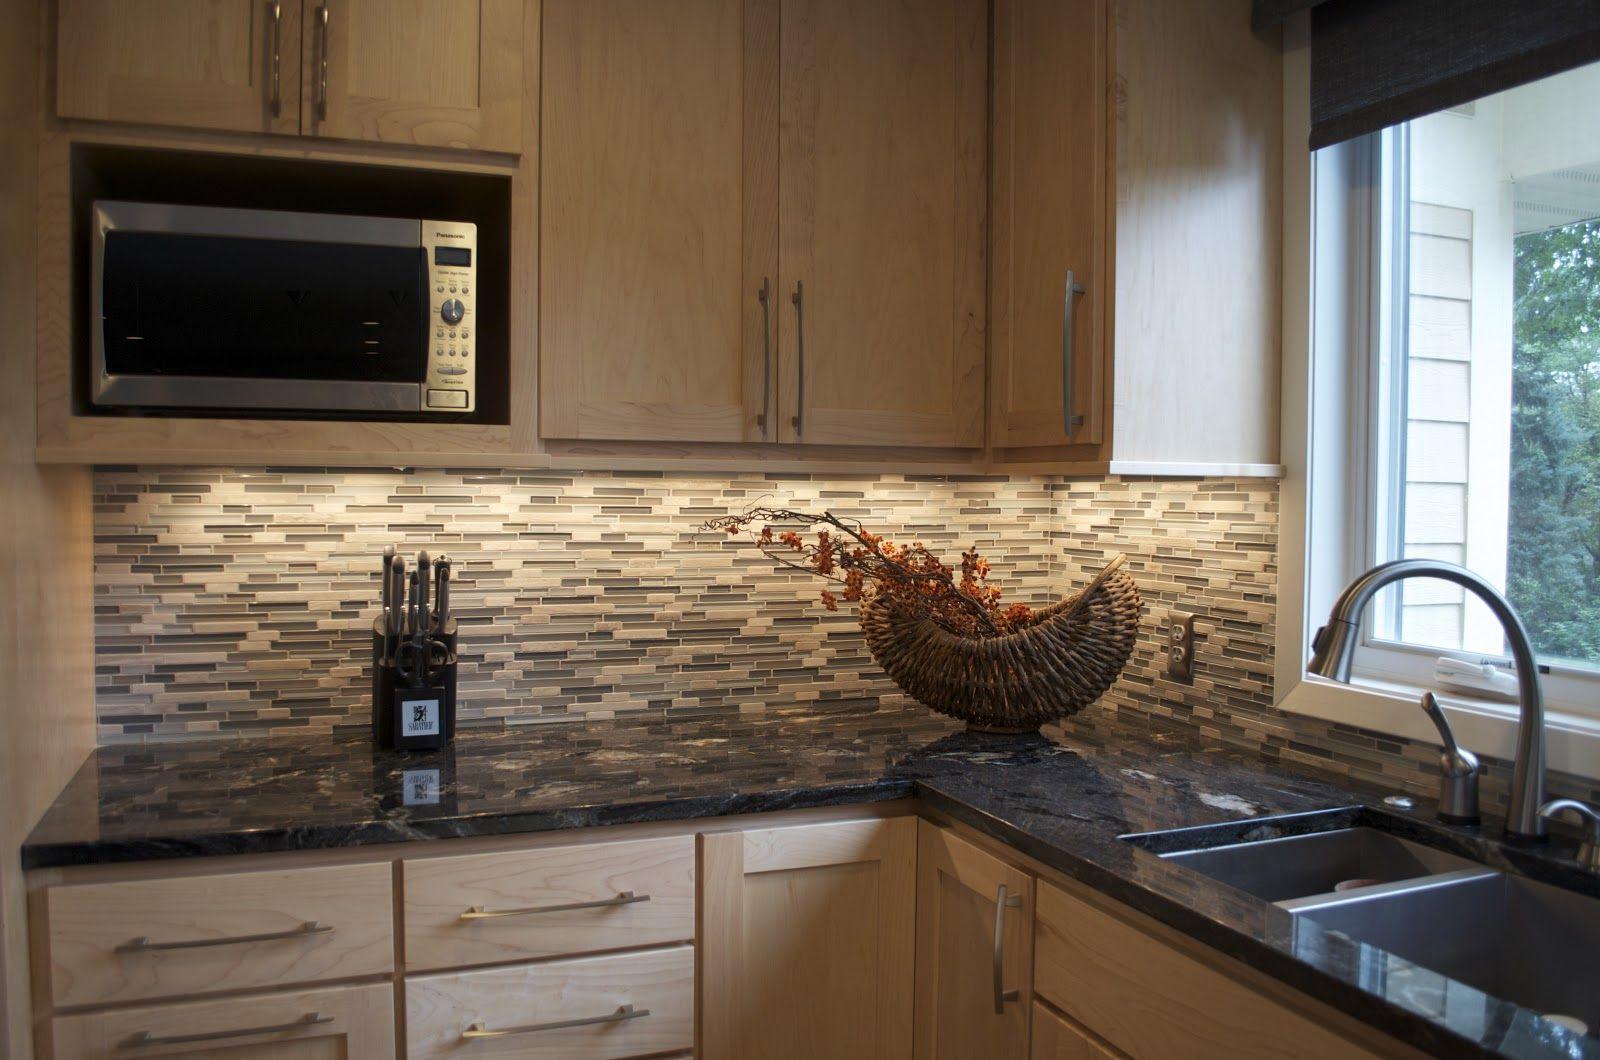 maple cabinet backsplash - Google Search | Modern kitchen ... on Backsplash For Maple Cabinets  id=96466